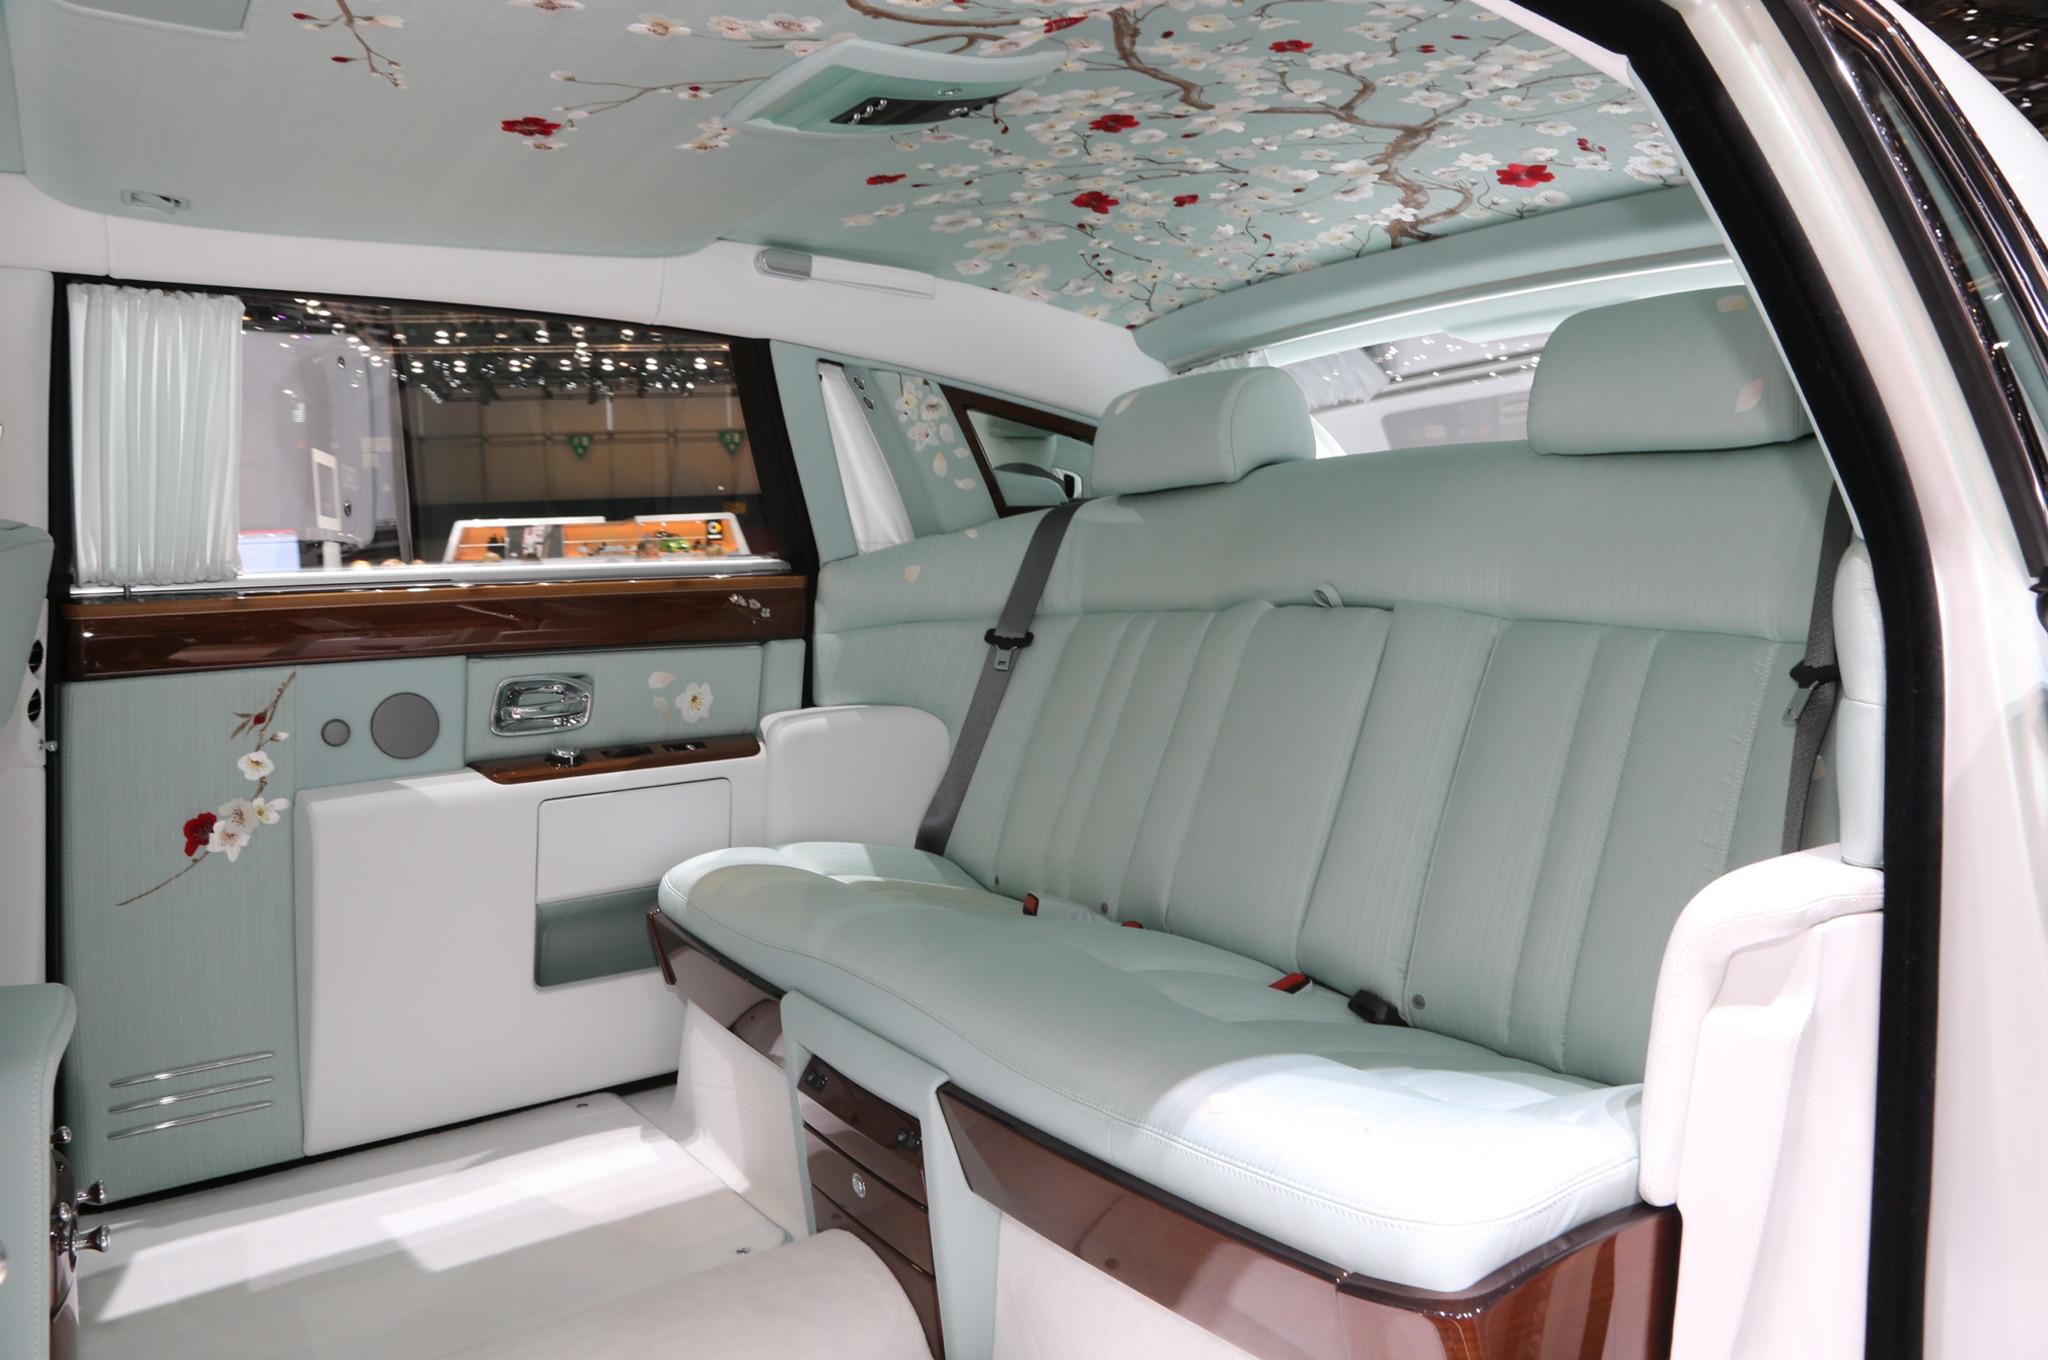 rolls royce phantom 2015 interior. show more rolls royce phantom 2015 interior